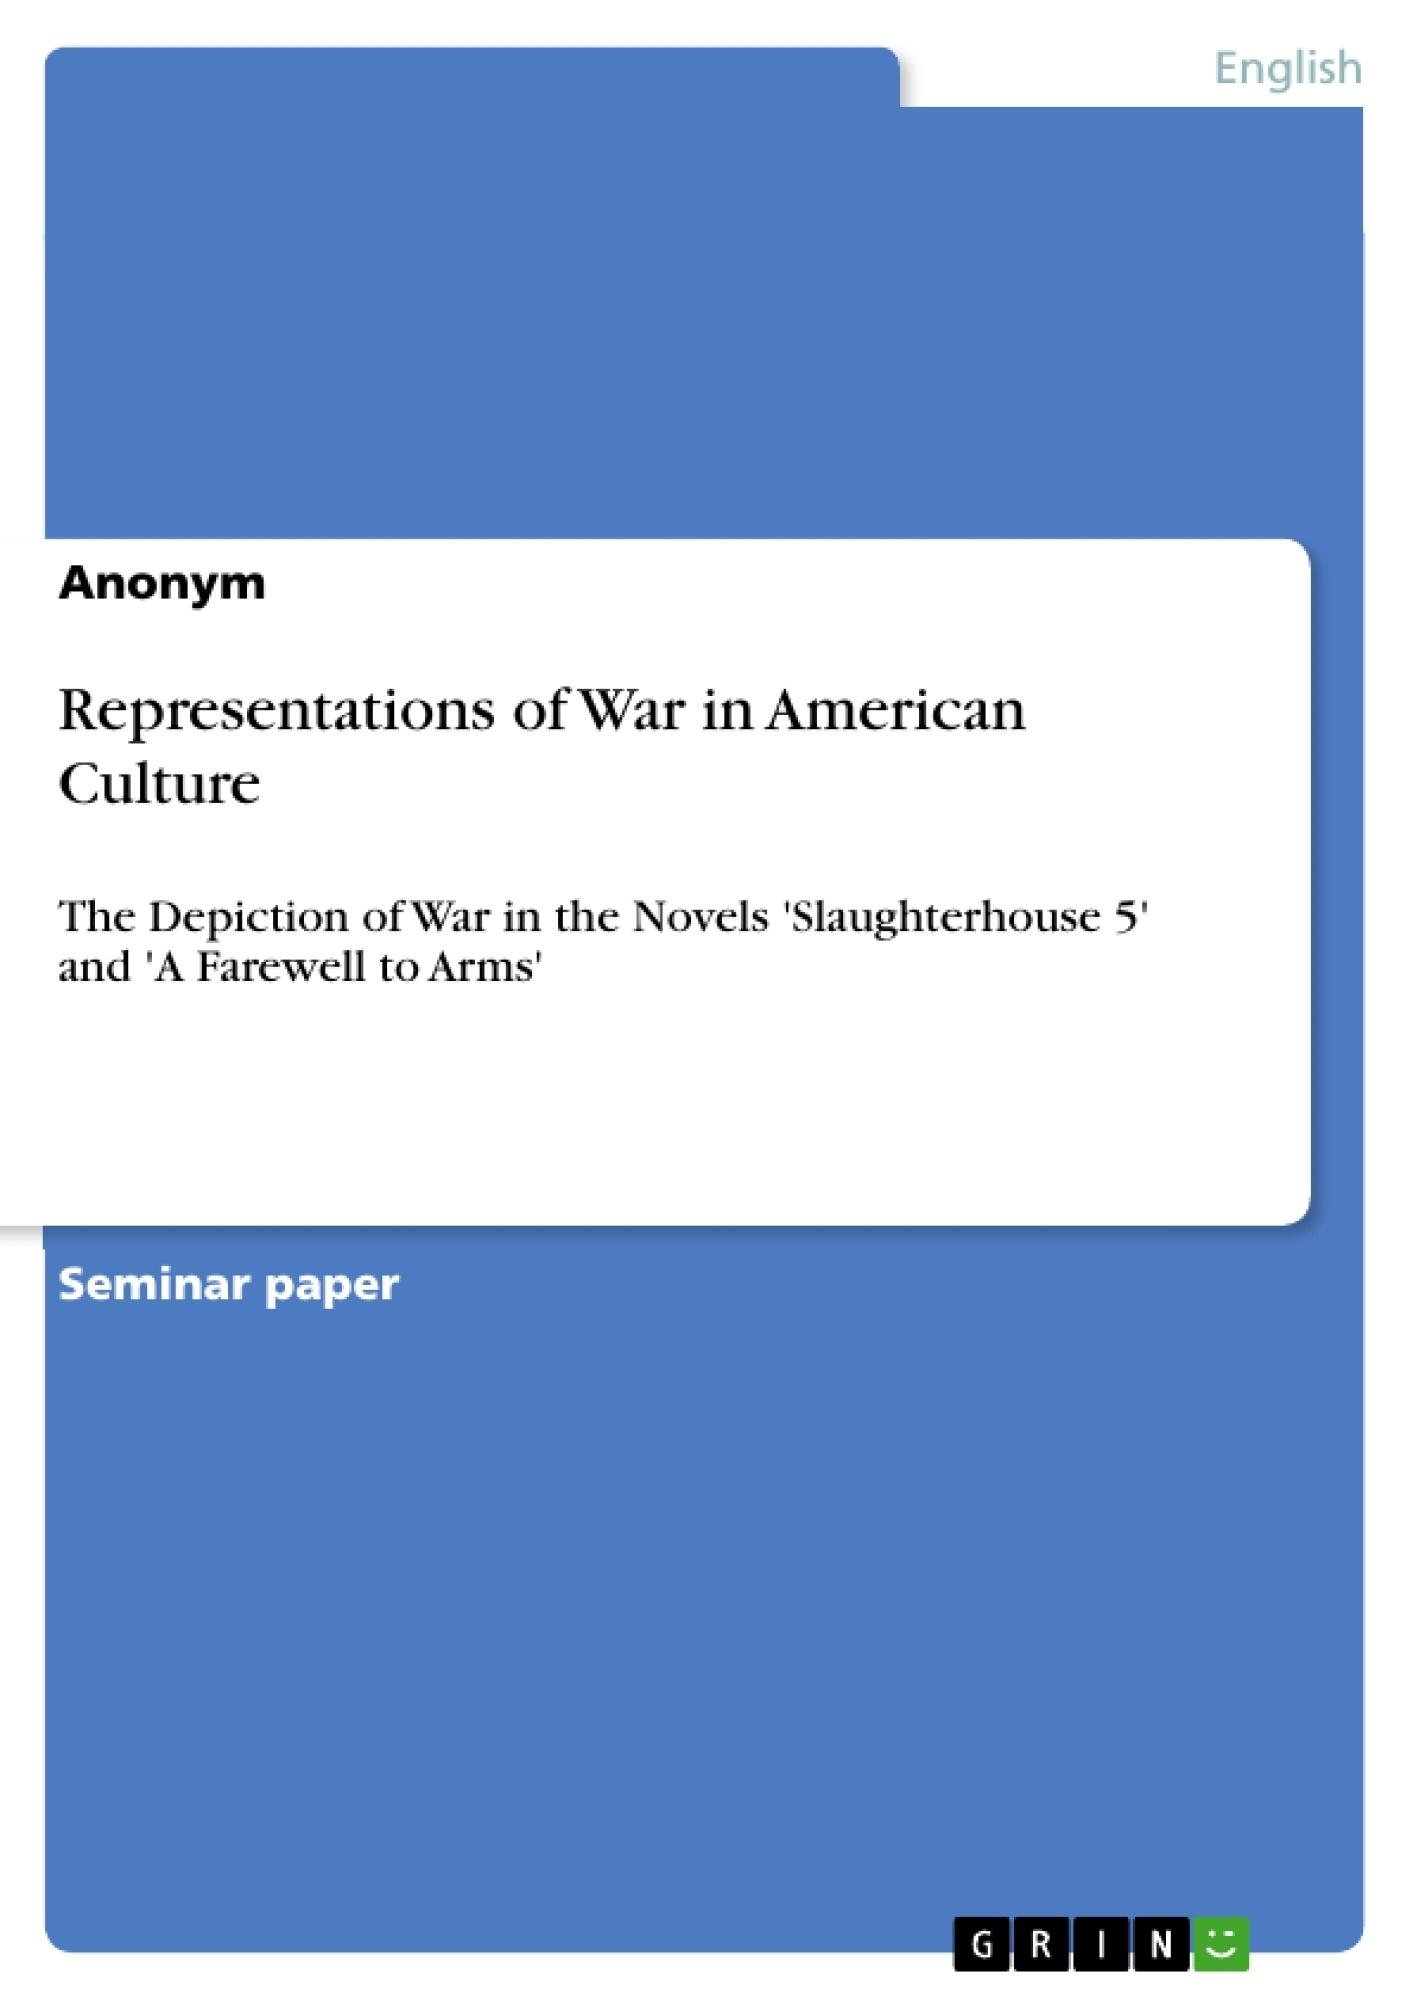 Title: Representations of War in American Culture